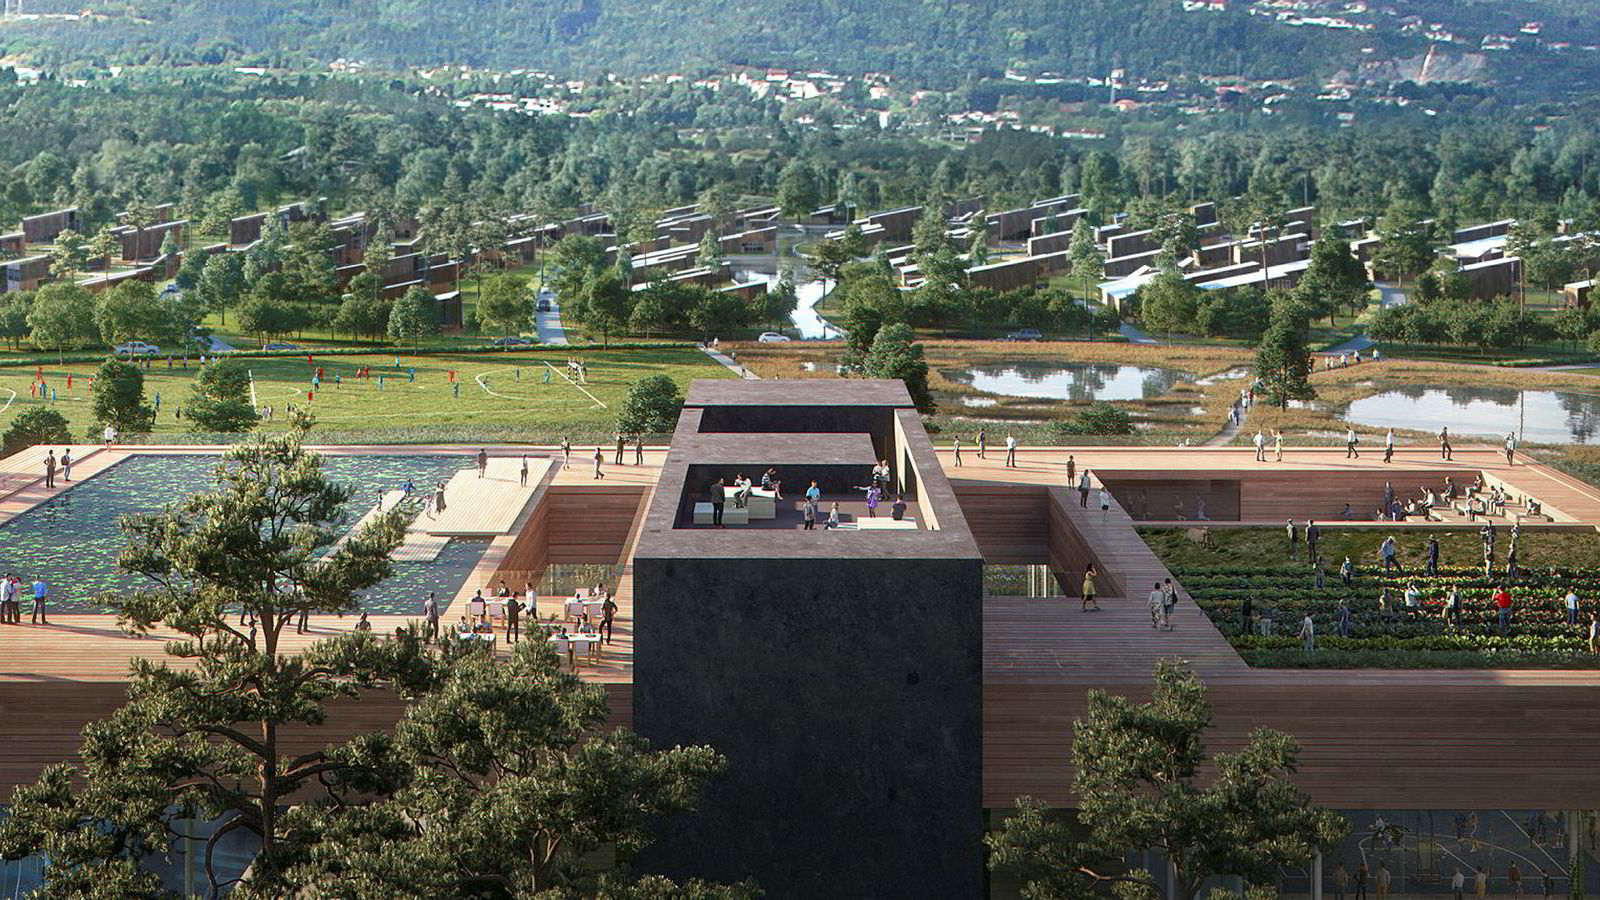 Gigantisk varmepumpe kan gi verdens første energipositive bydel